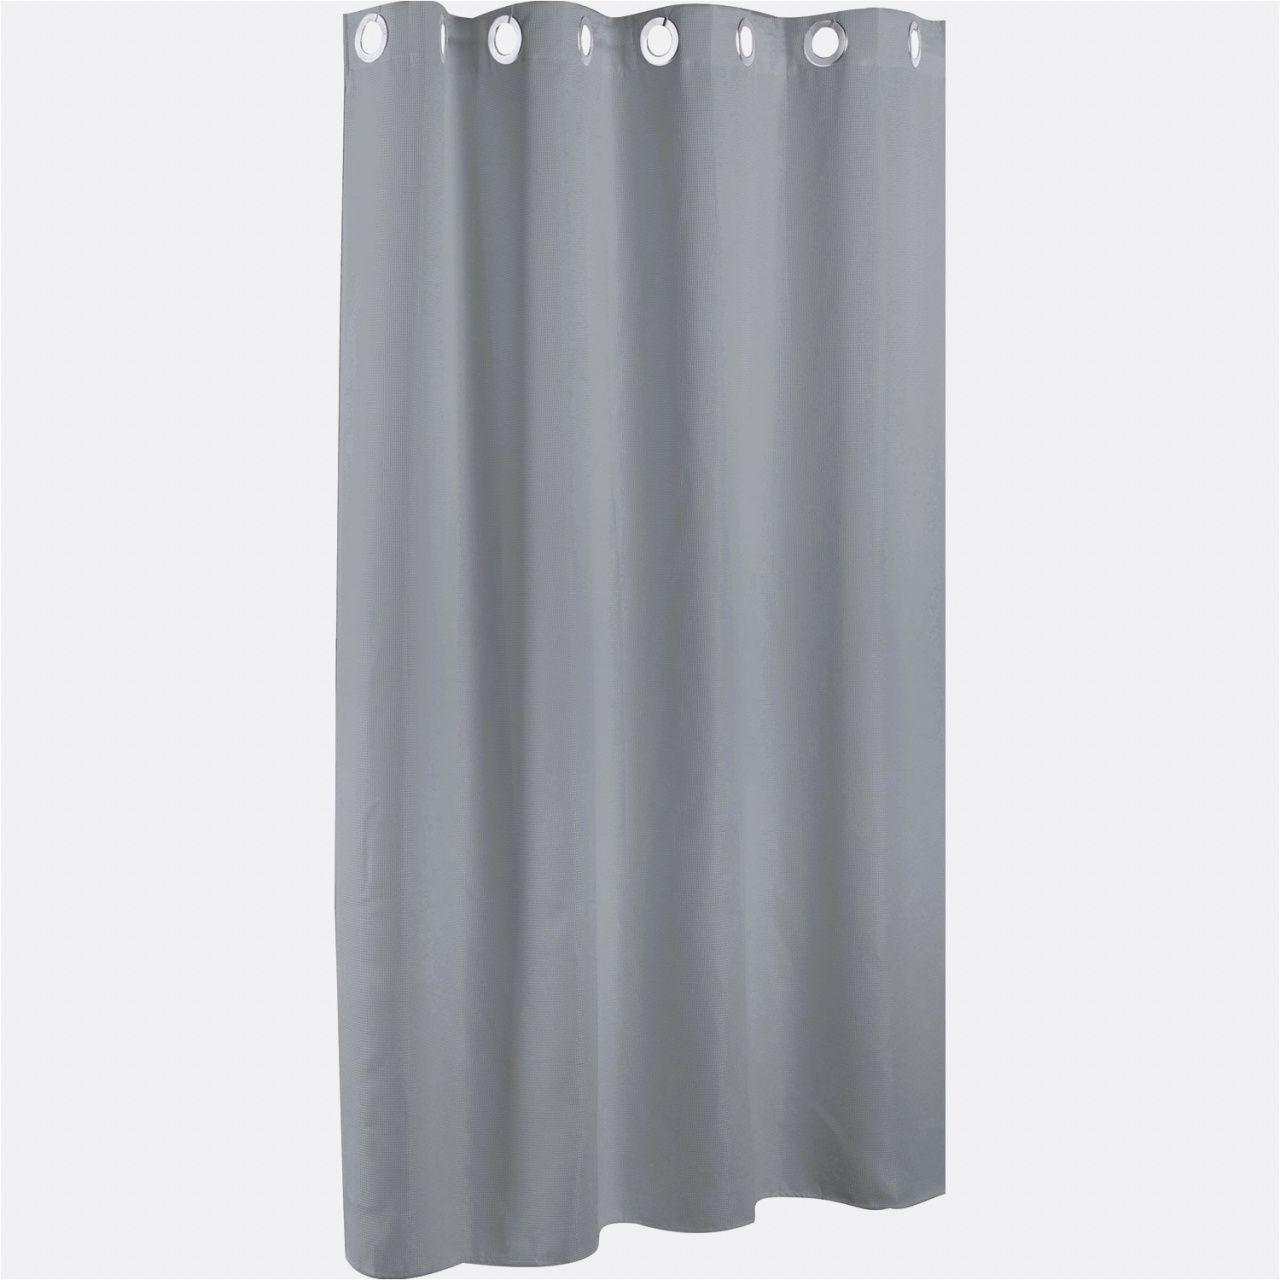 201 Panier A Linge Gifi Shower Curtain Basic Shower Curtain